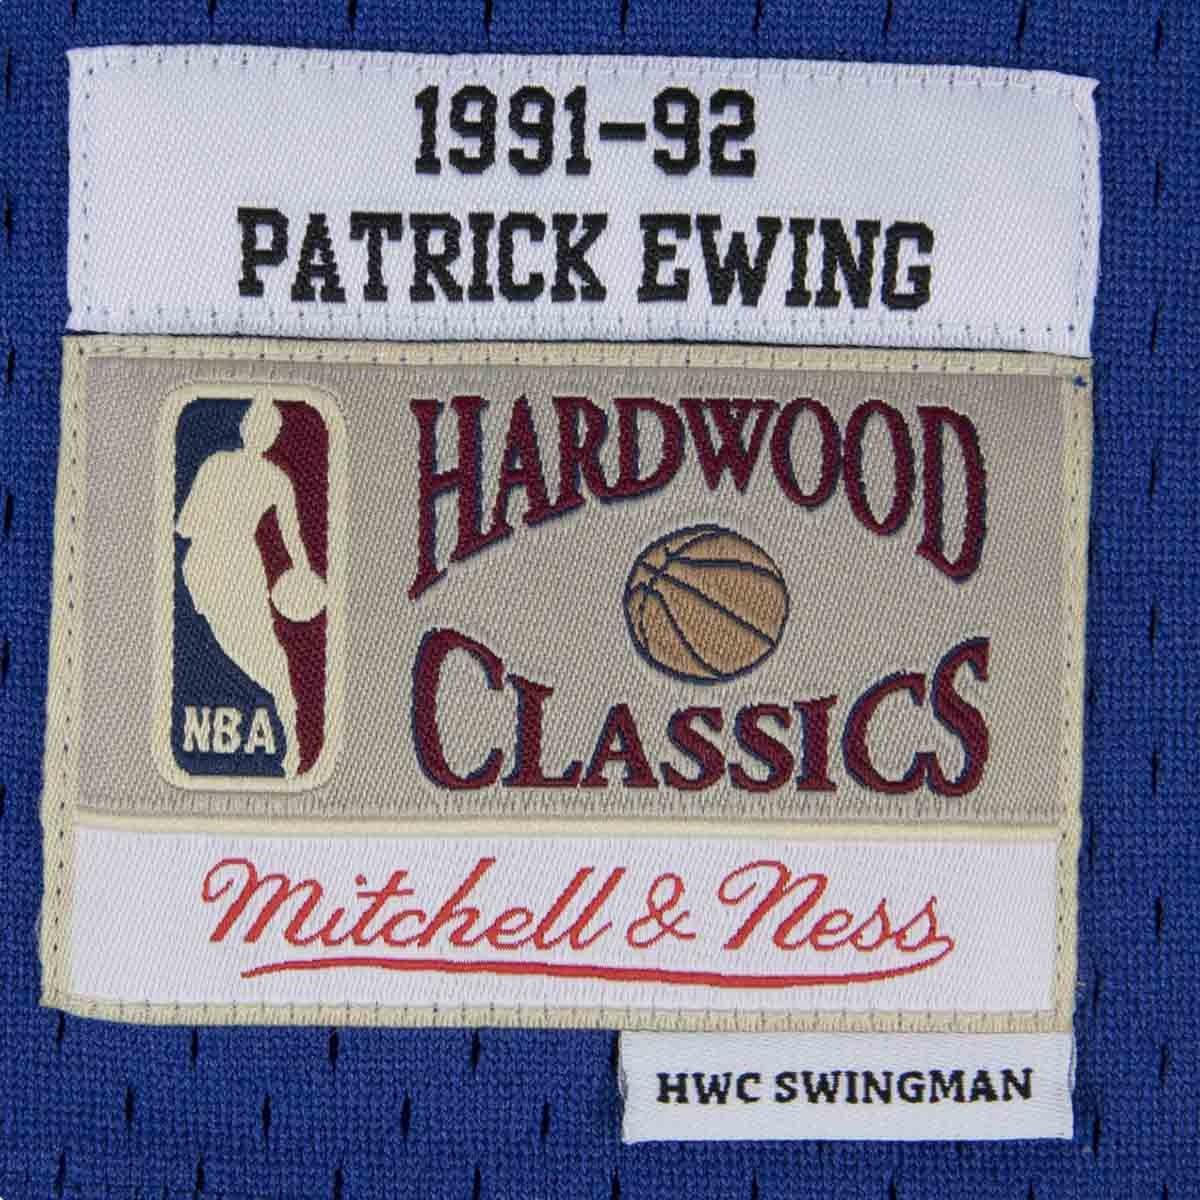 4a35f3d60c regata adidas nba swingman retired new york knicks 33 ewing. Carregando  zoom.